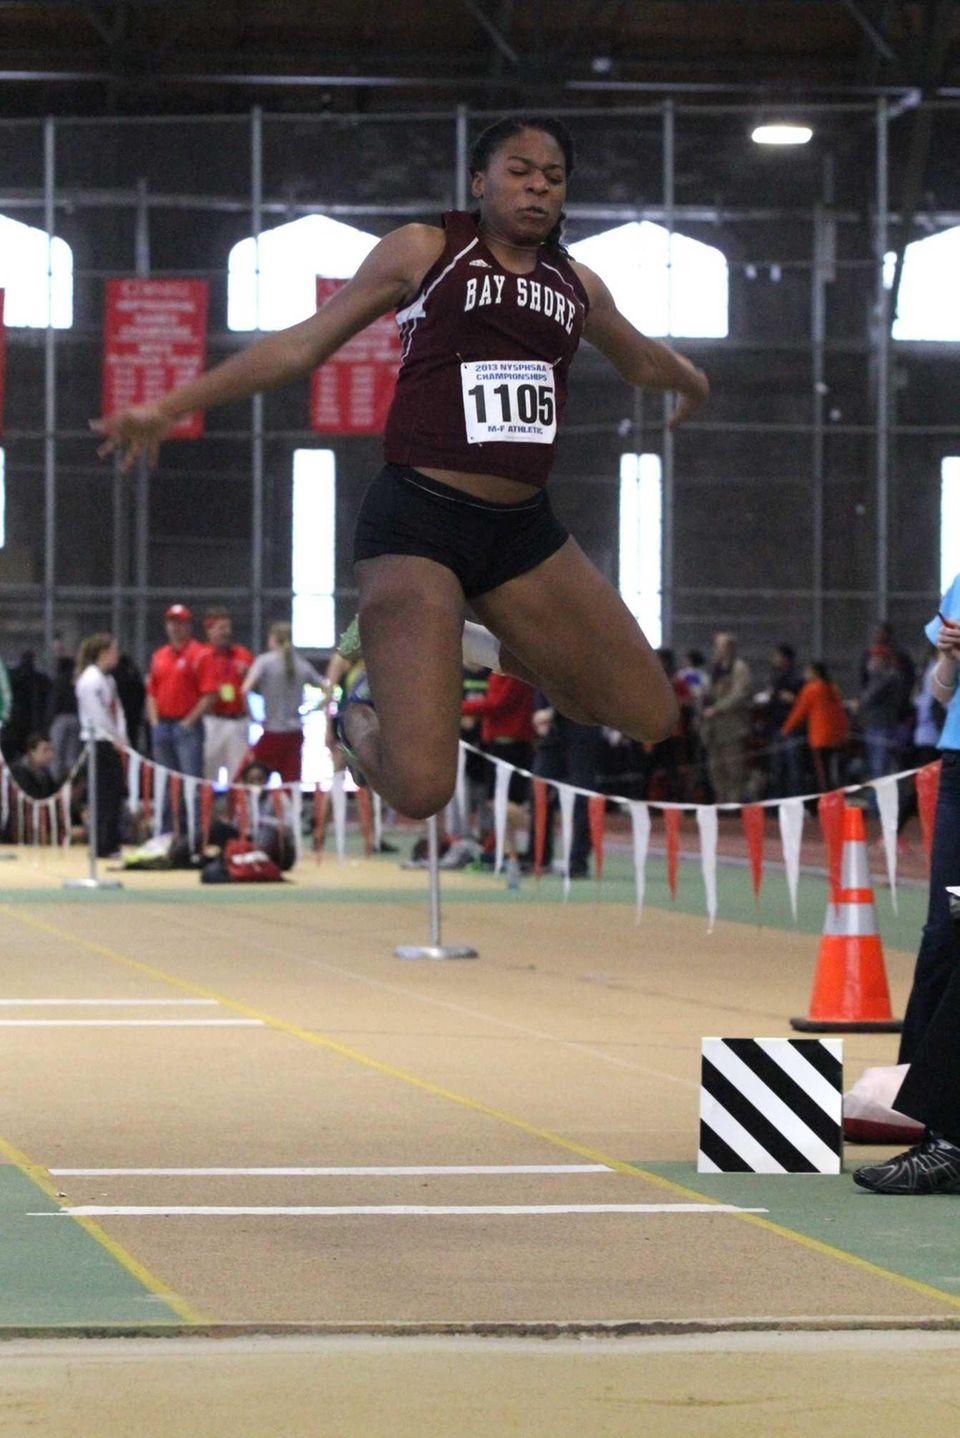 Bay Shore's Anisa Toppin flies through the air